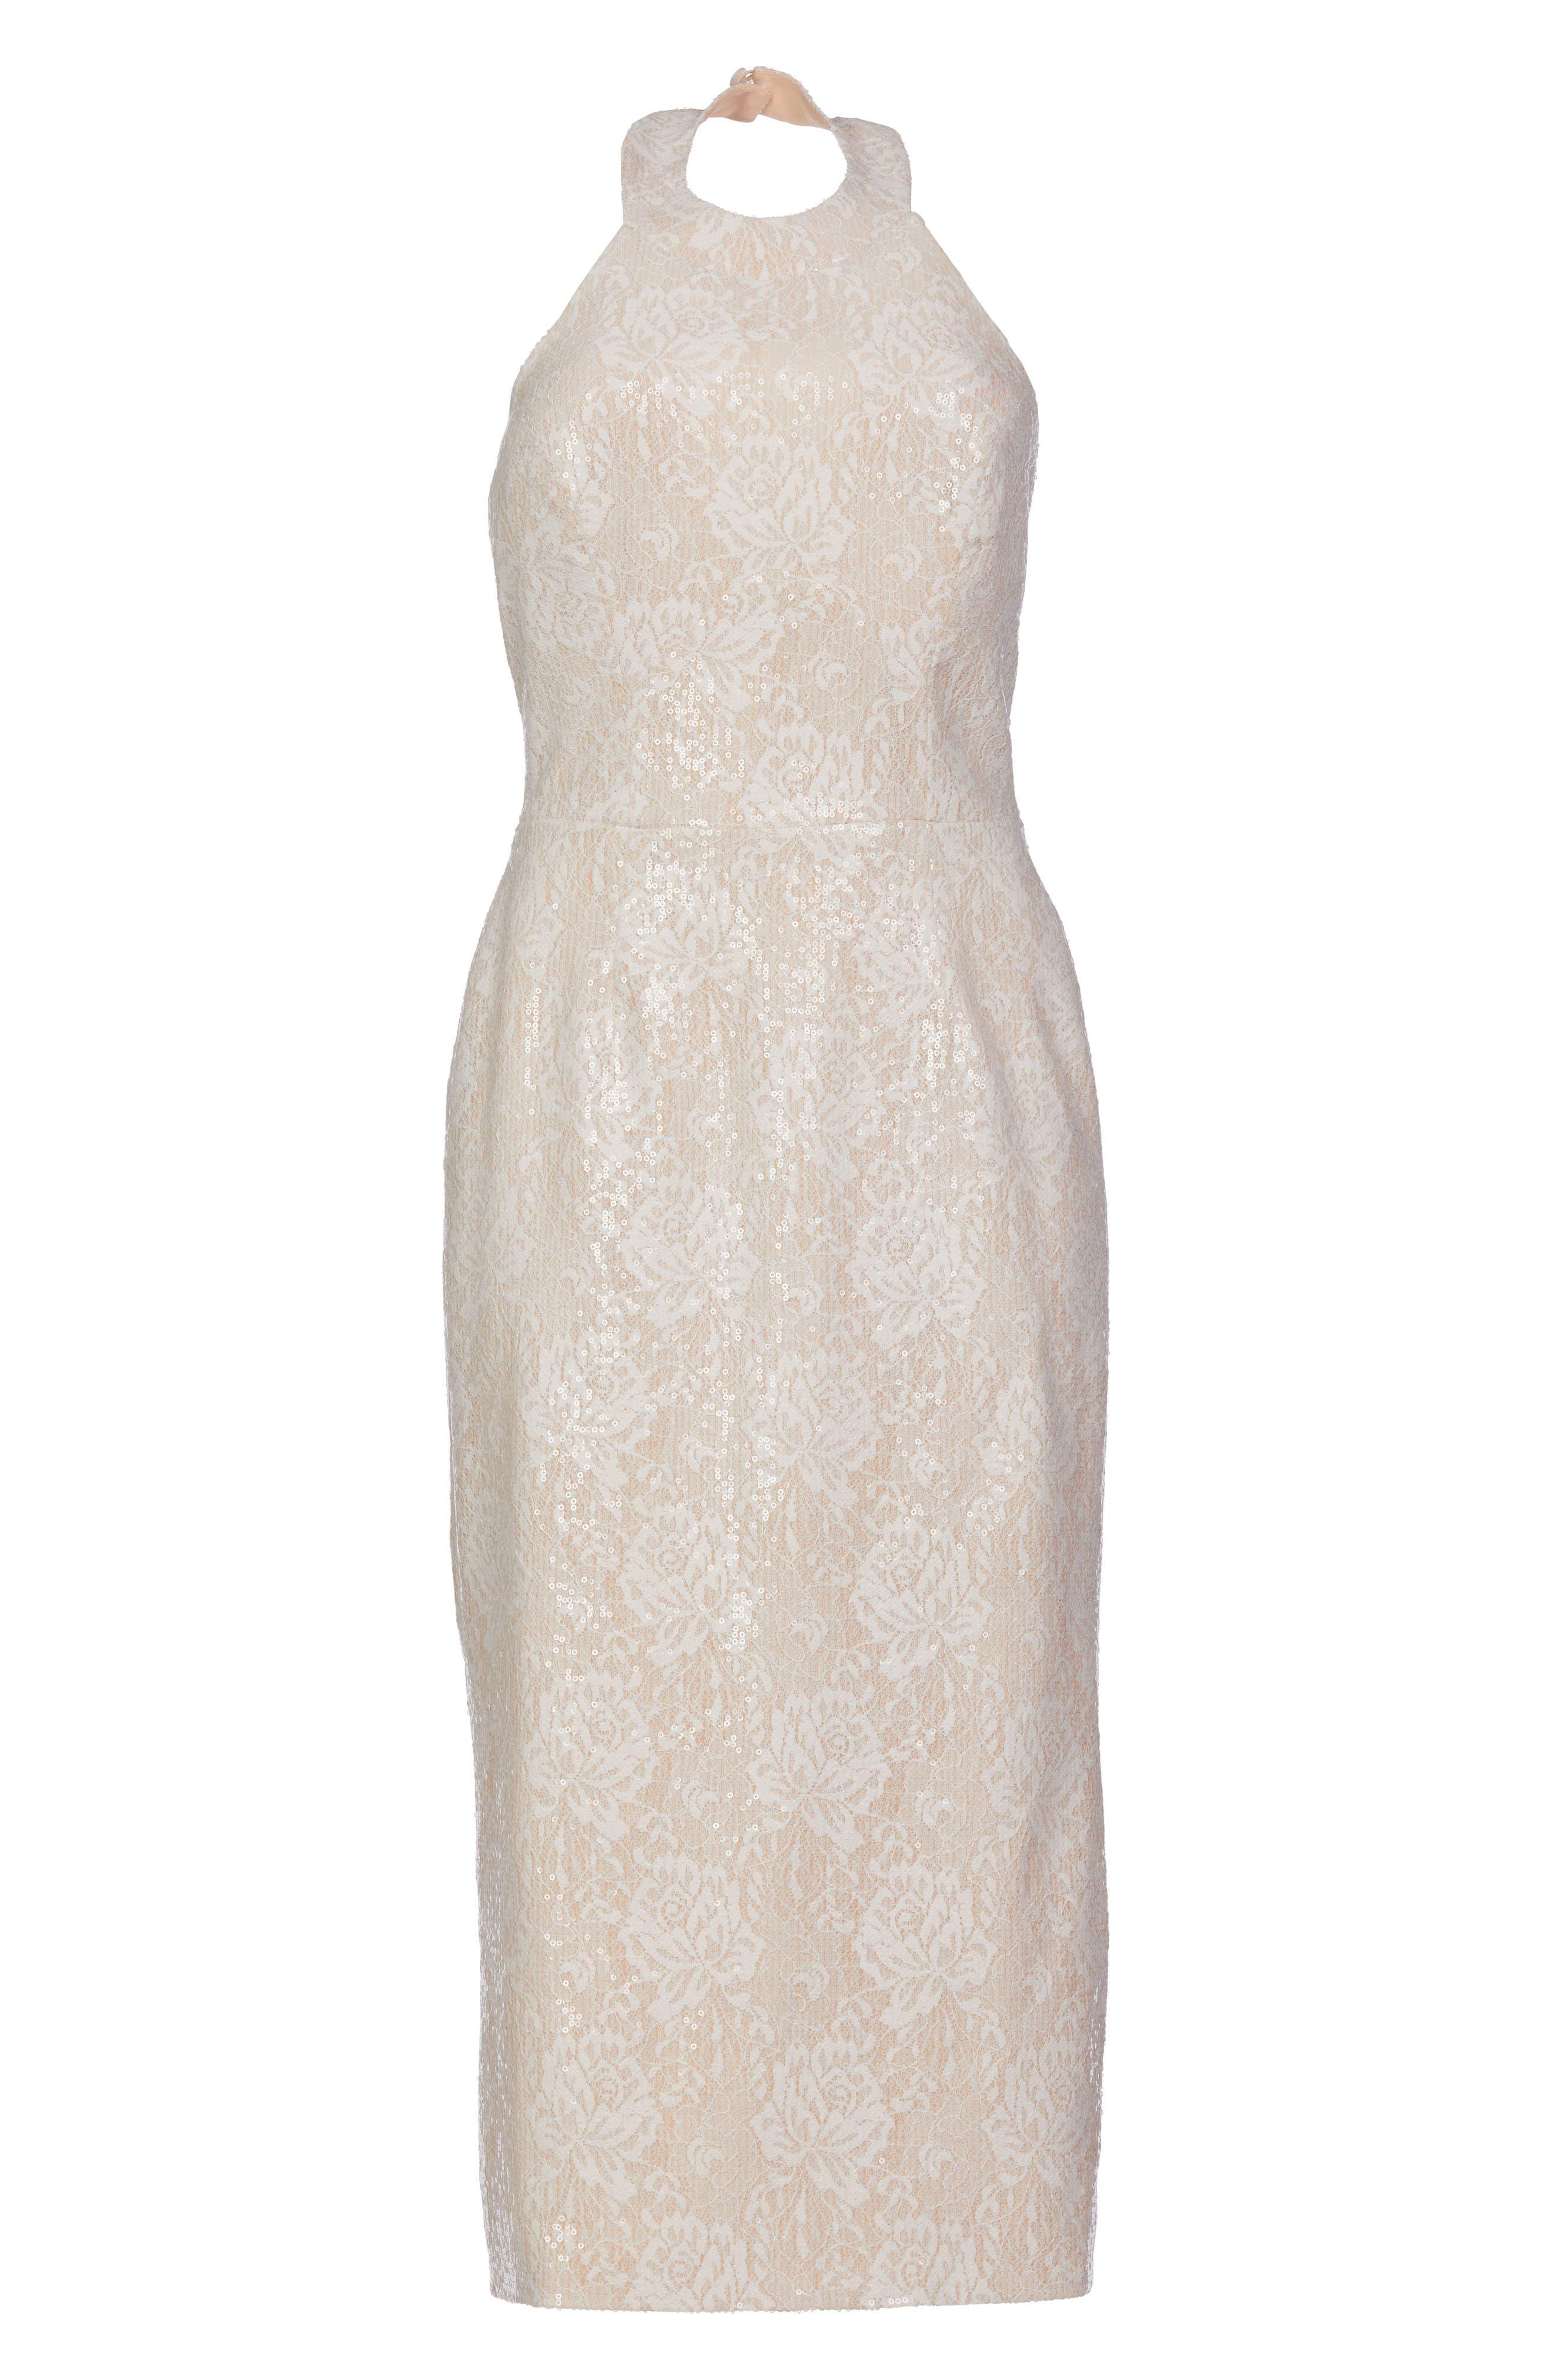 Cassie Sequin Midi Dress,                             Alternate thumbnail 27, color,